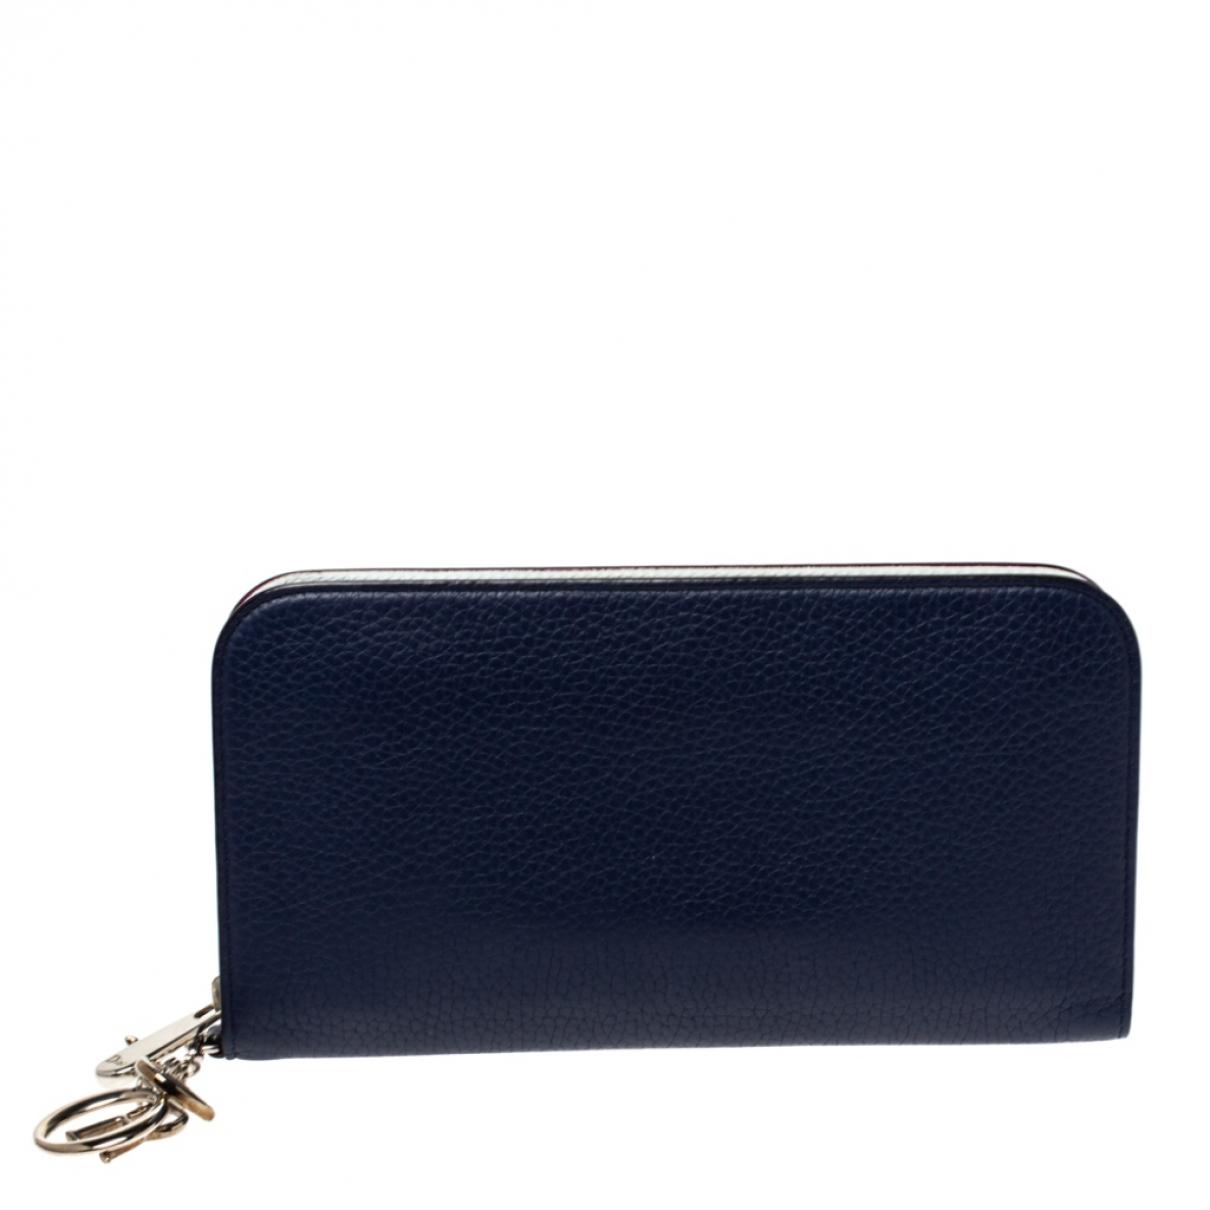 Dior Diorissimo Portemonnaie in  Blau Leder